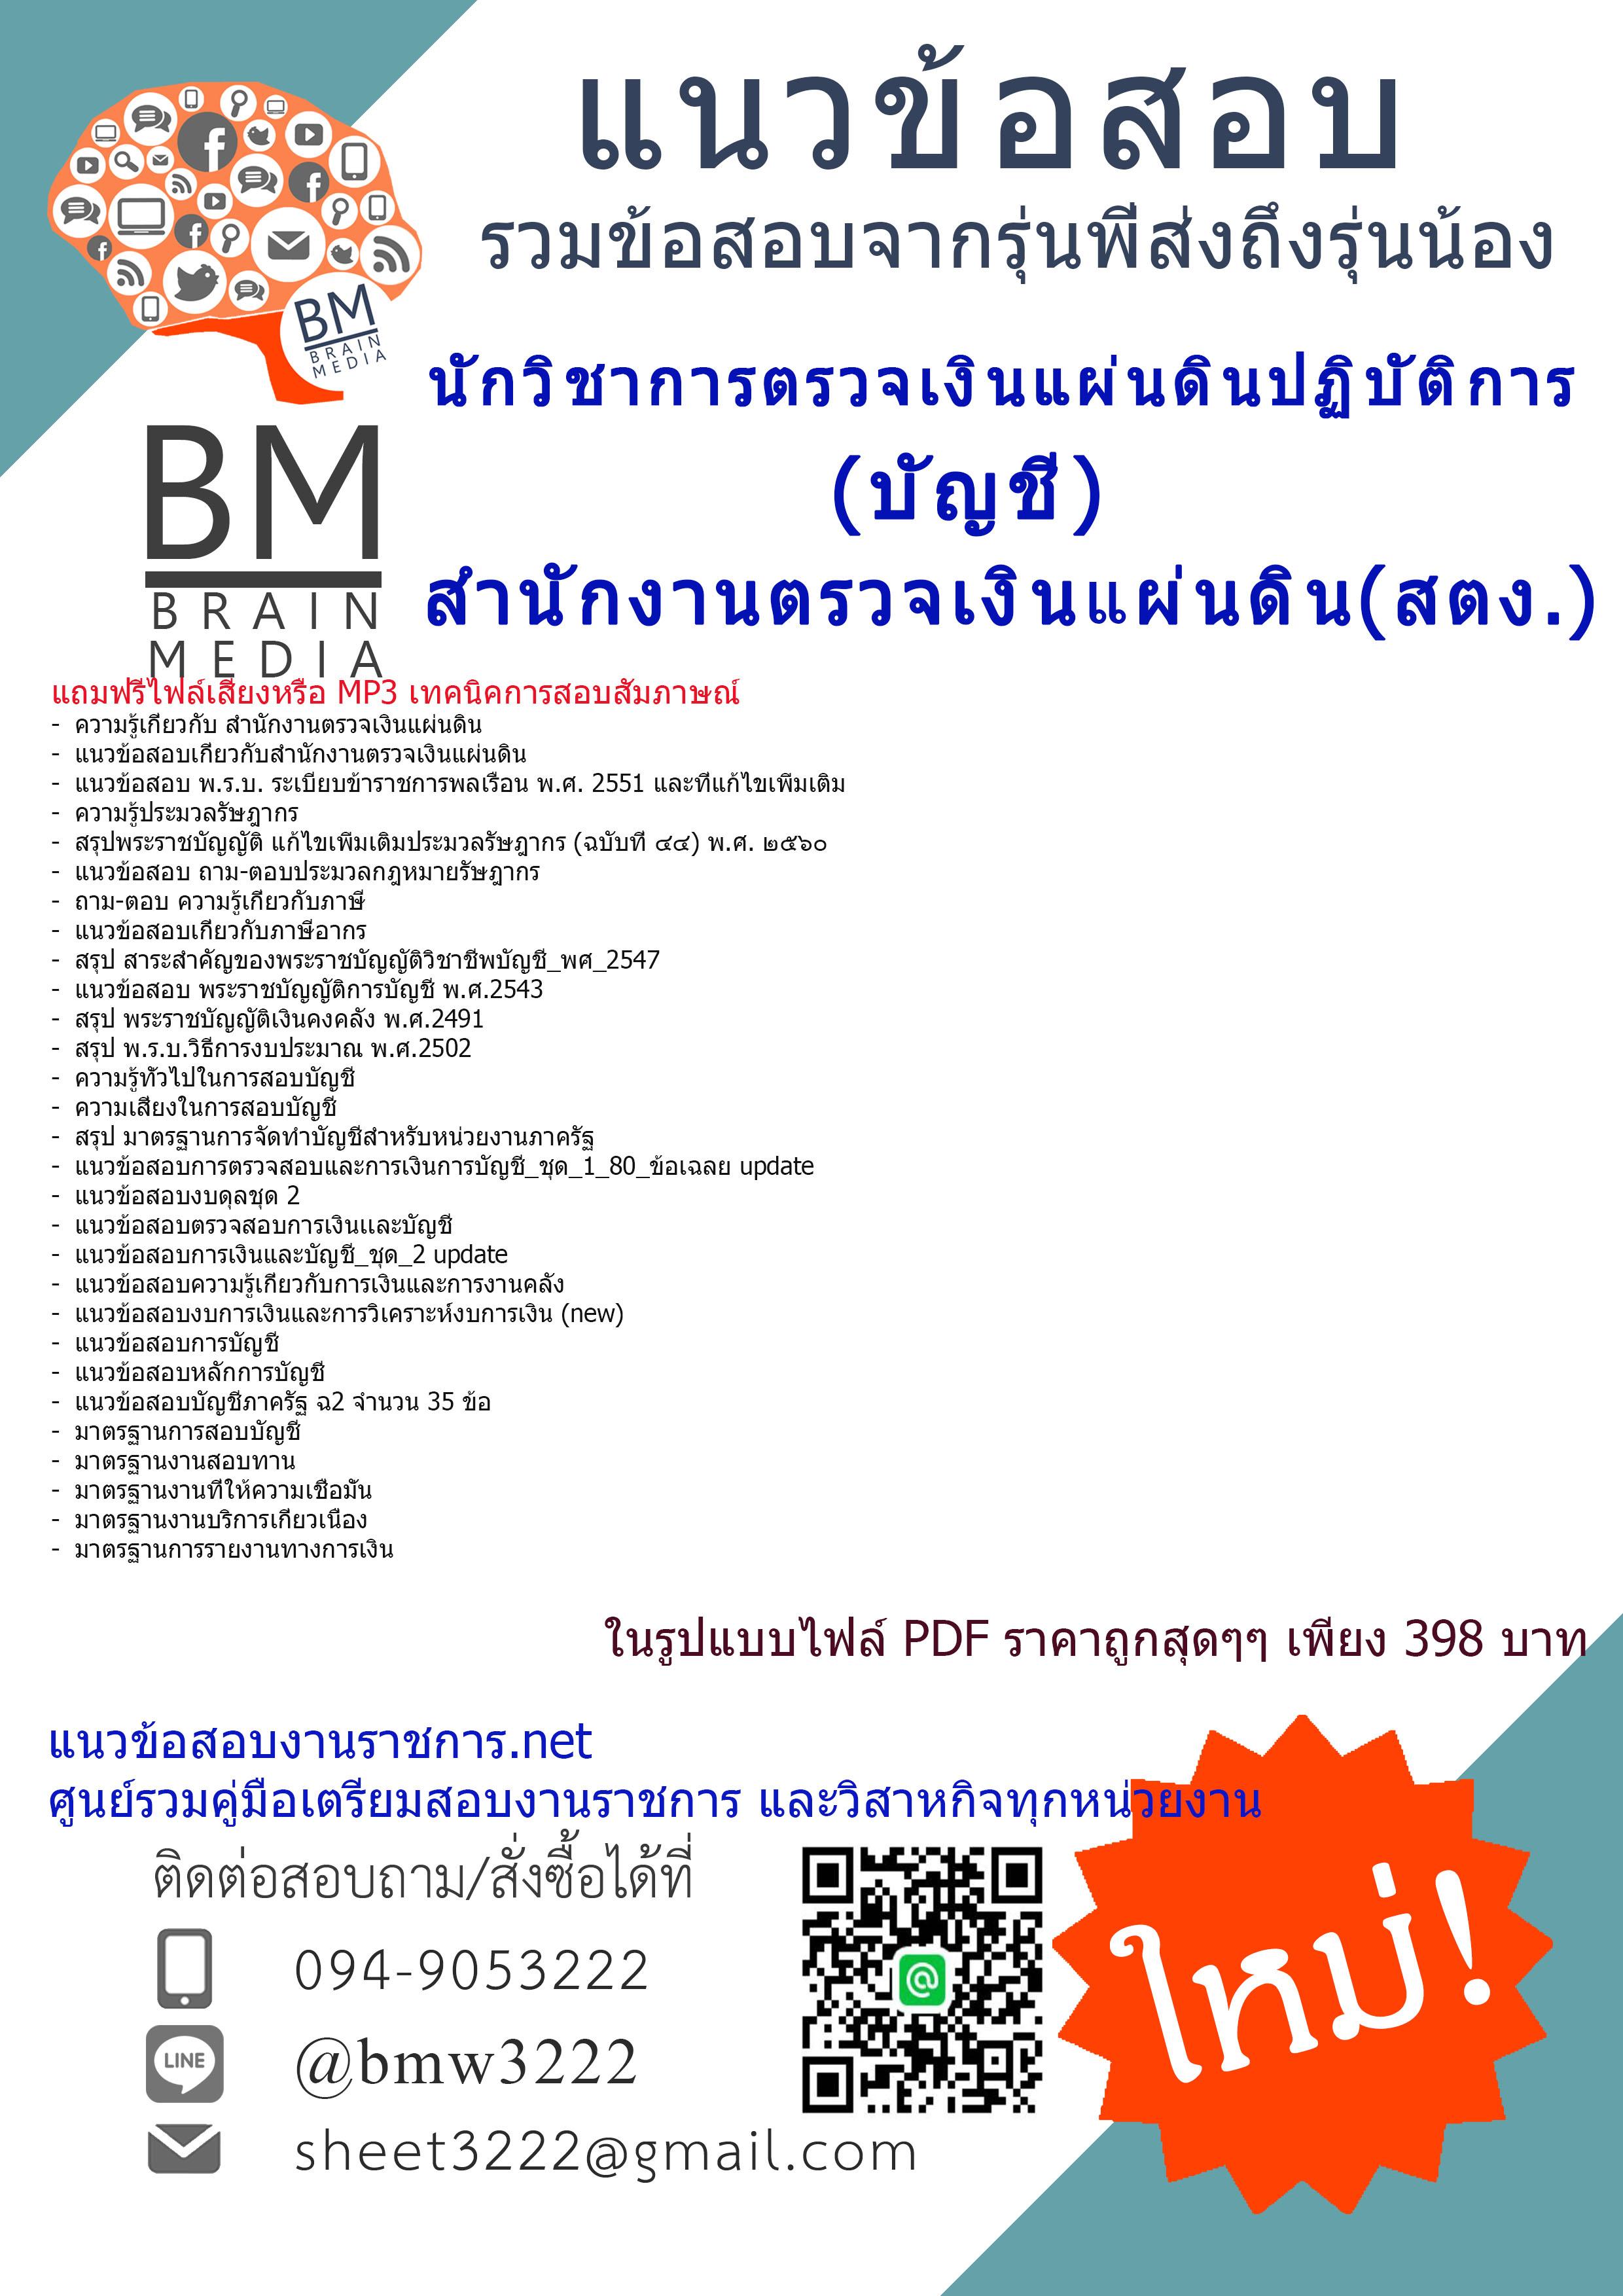 (((updateที่สุด)))แนวข้อสอบนักวิชาการตรวจเงินแผ่นดินปฏิบัติการบัญชีสำนักงานตรวจเงินแผ่นดินสตง.